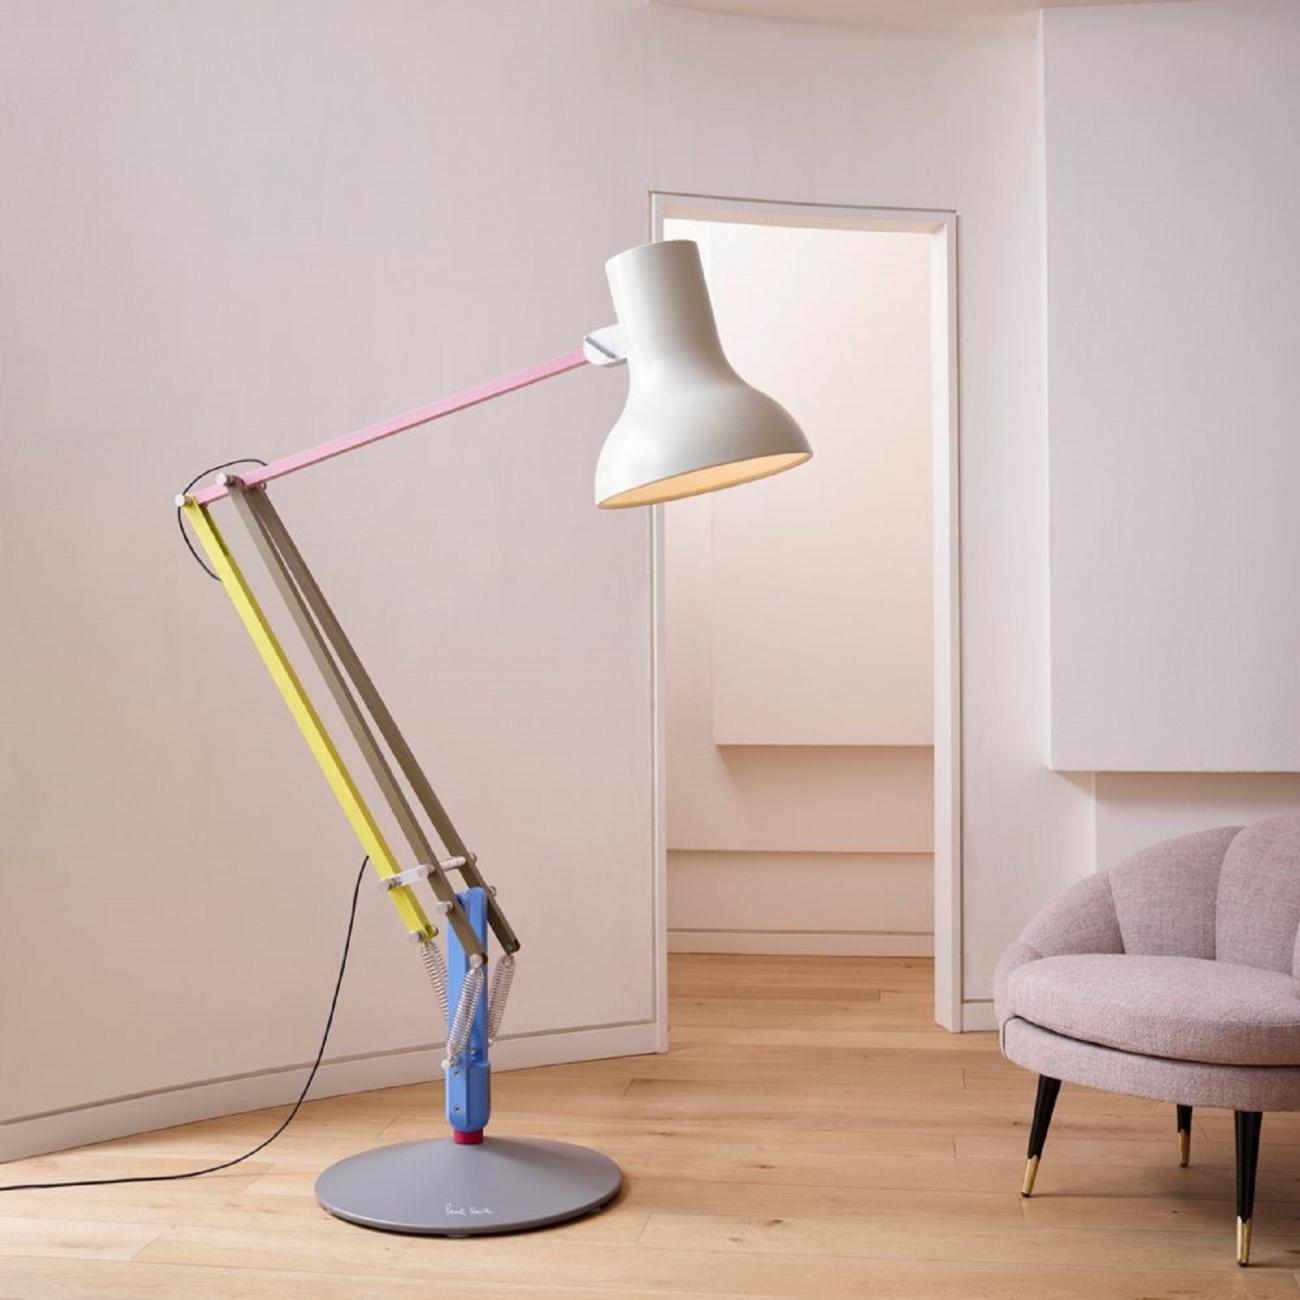 Anglepoise Type 75 Giant Paul Smith Floor Lamp Tattahome